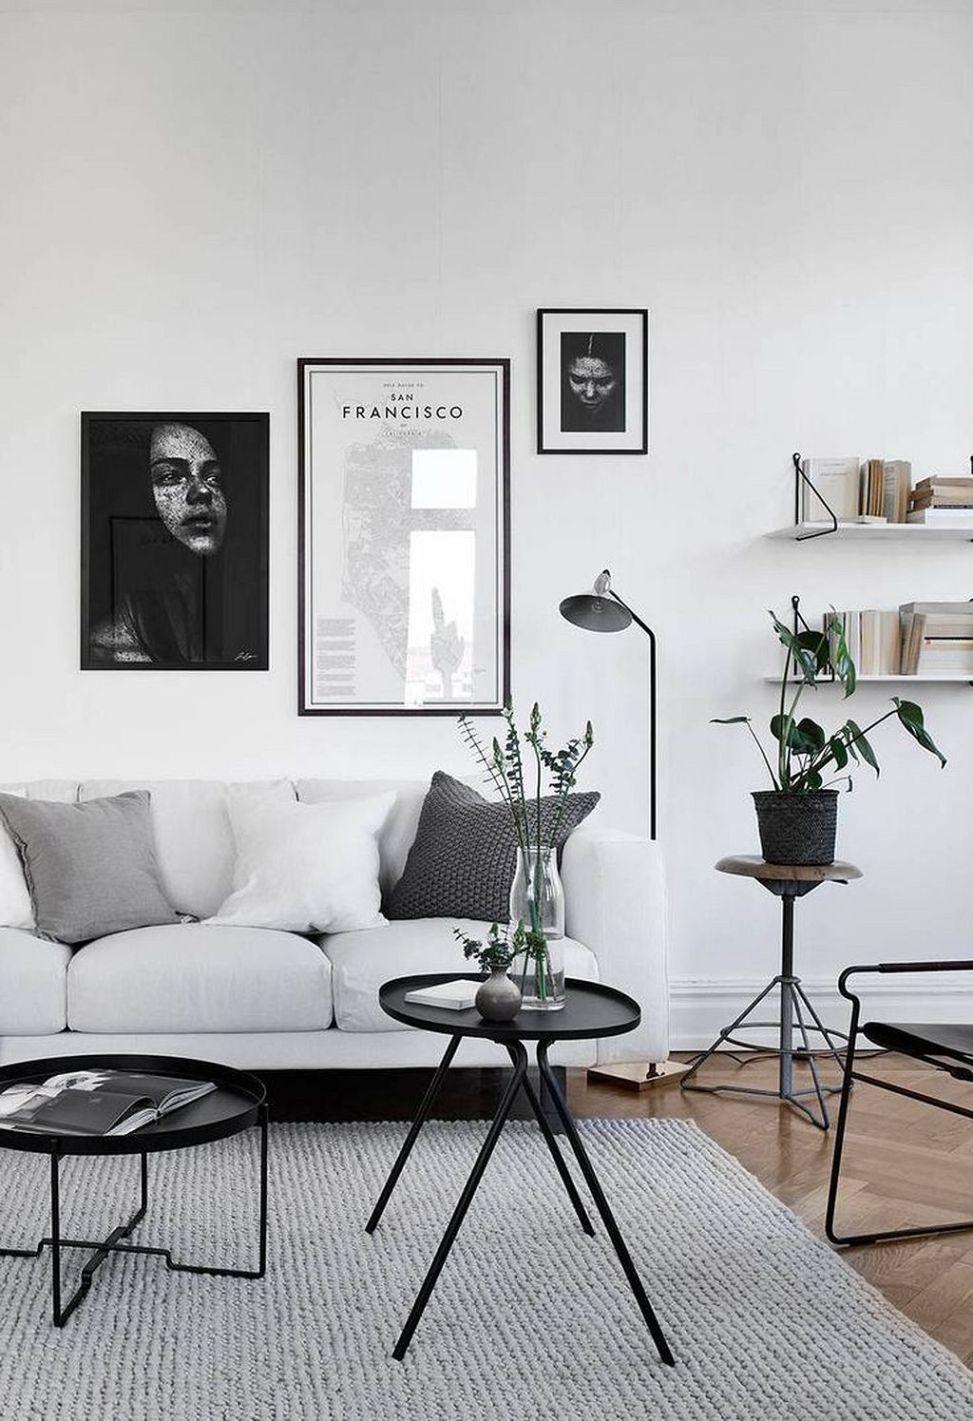 Modern Scandinavian Living Room Inspiration 38 Minimalist Living Room Decor Living Room Scandinavian Scandinavian Design Living Room #scandi #modern #living #room